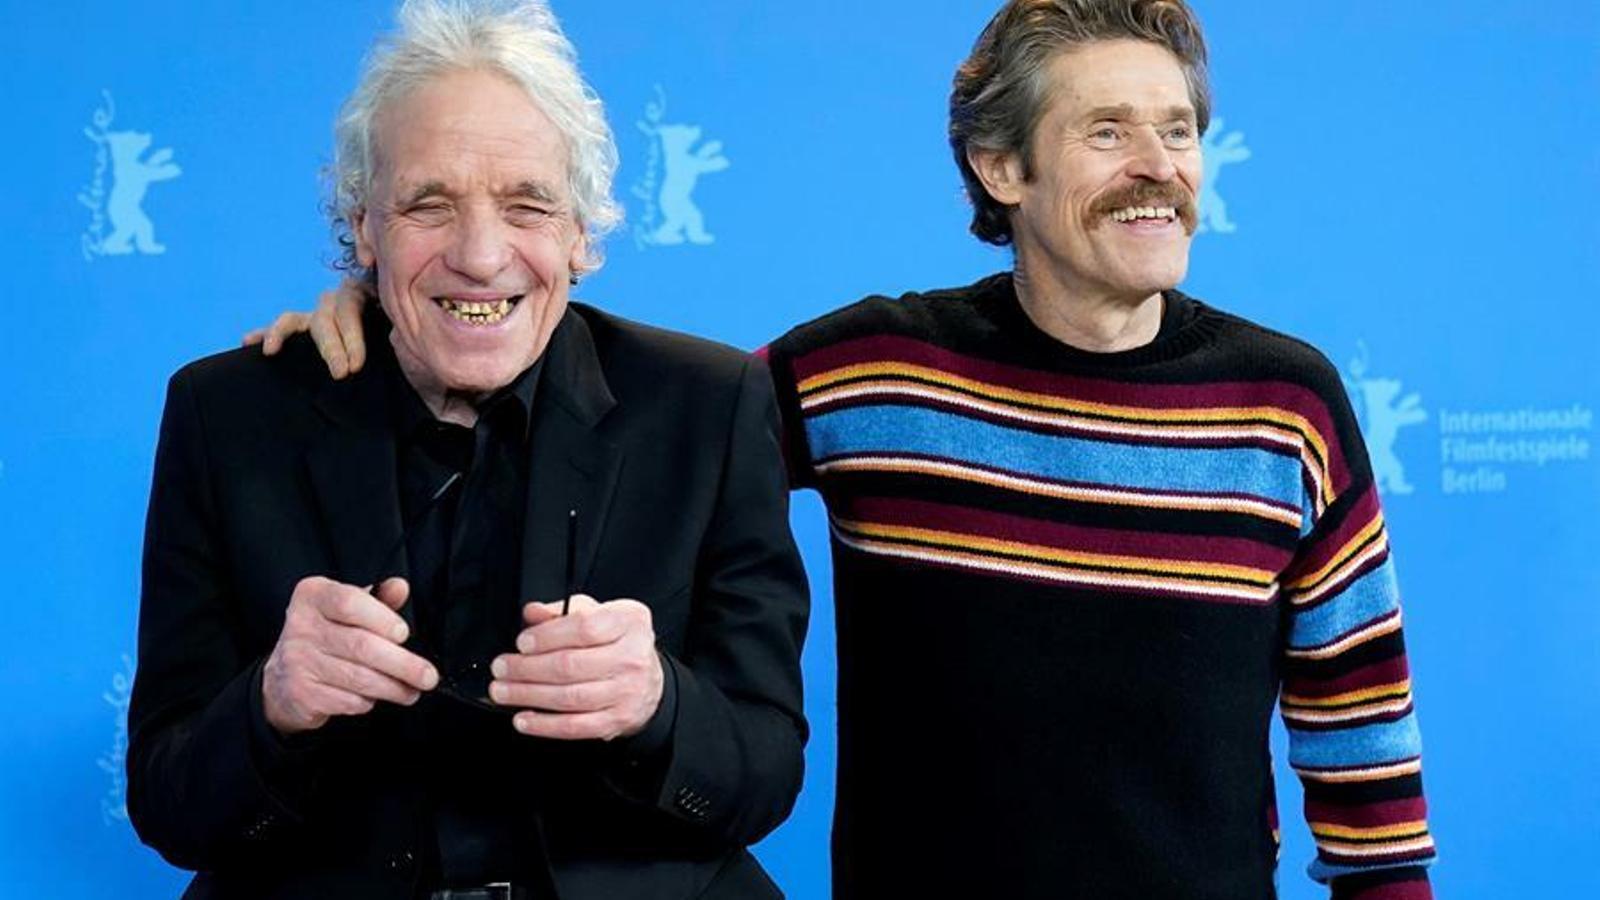 Abel Ferrara i Willem Dafoe a la Berlinale presentant 'Siberia'